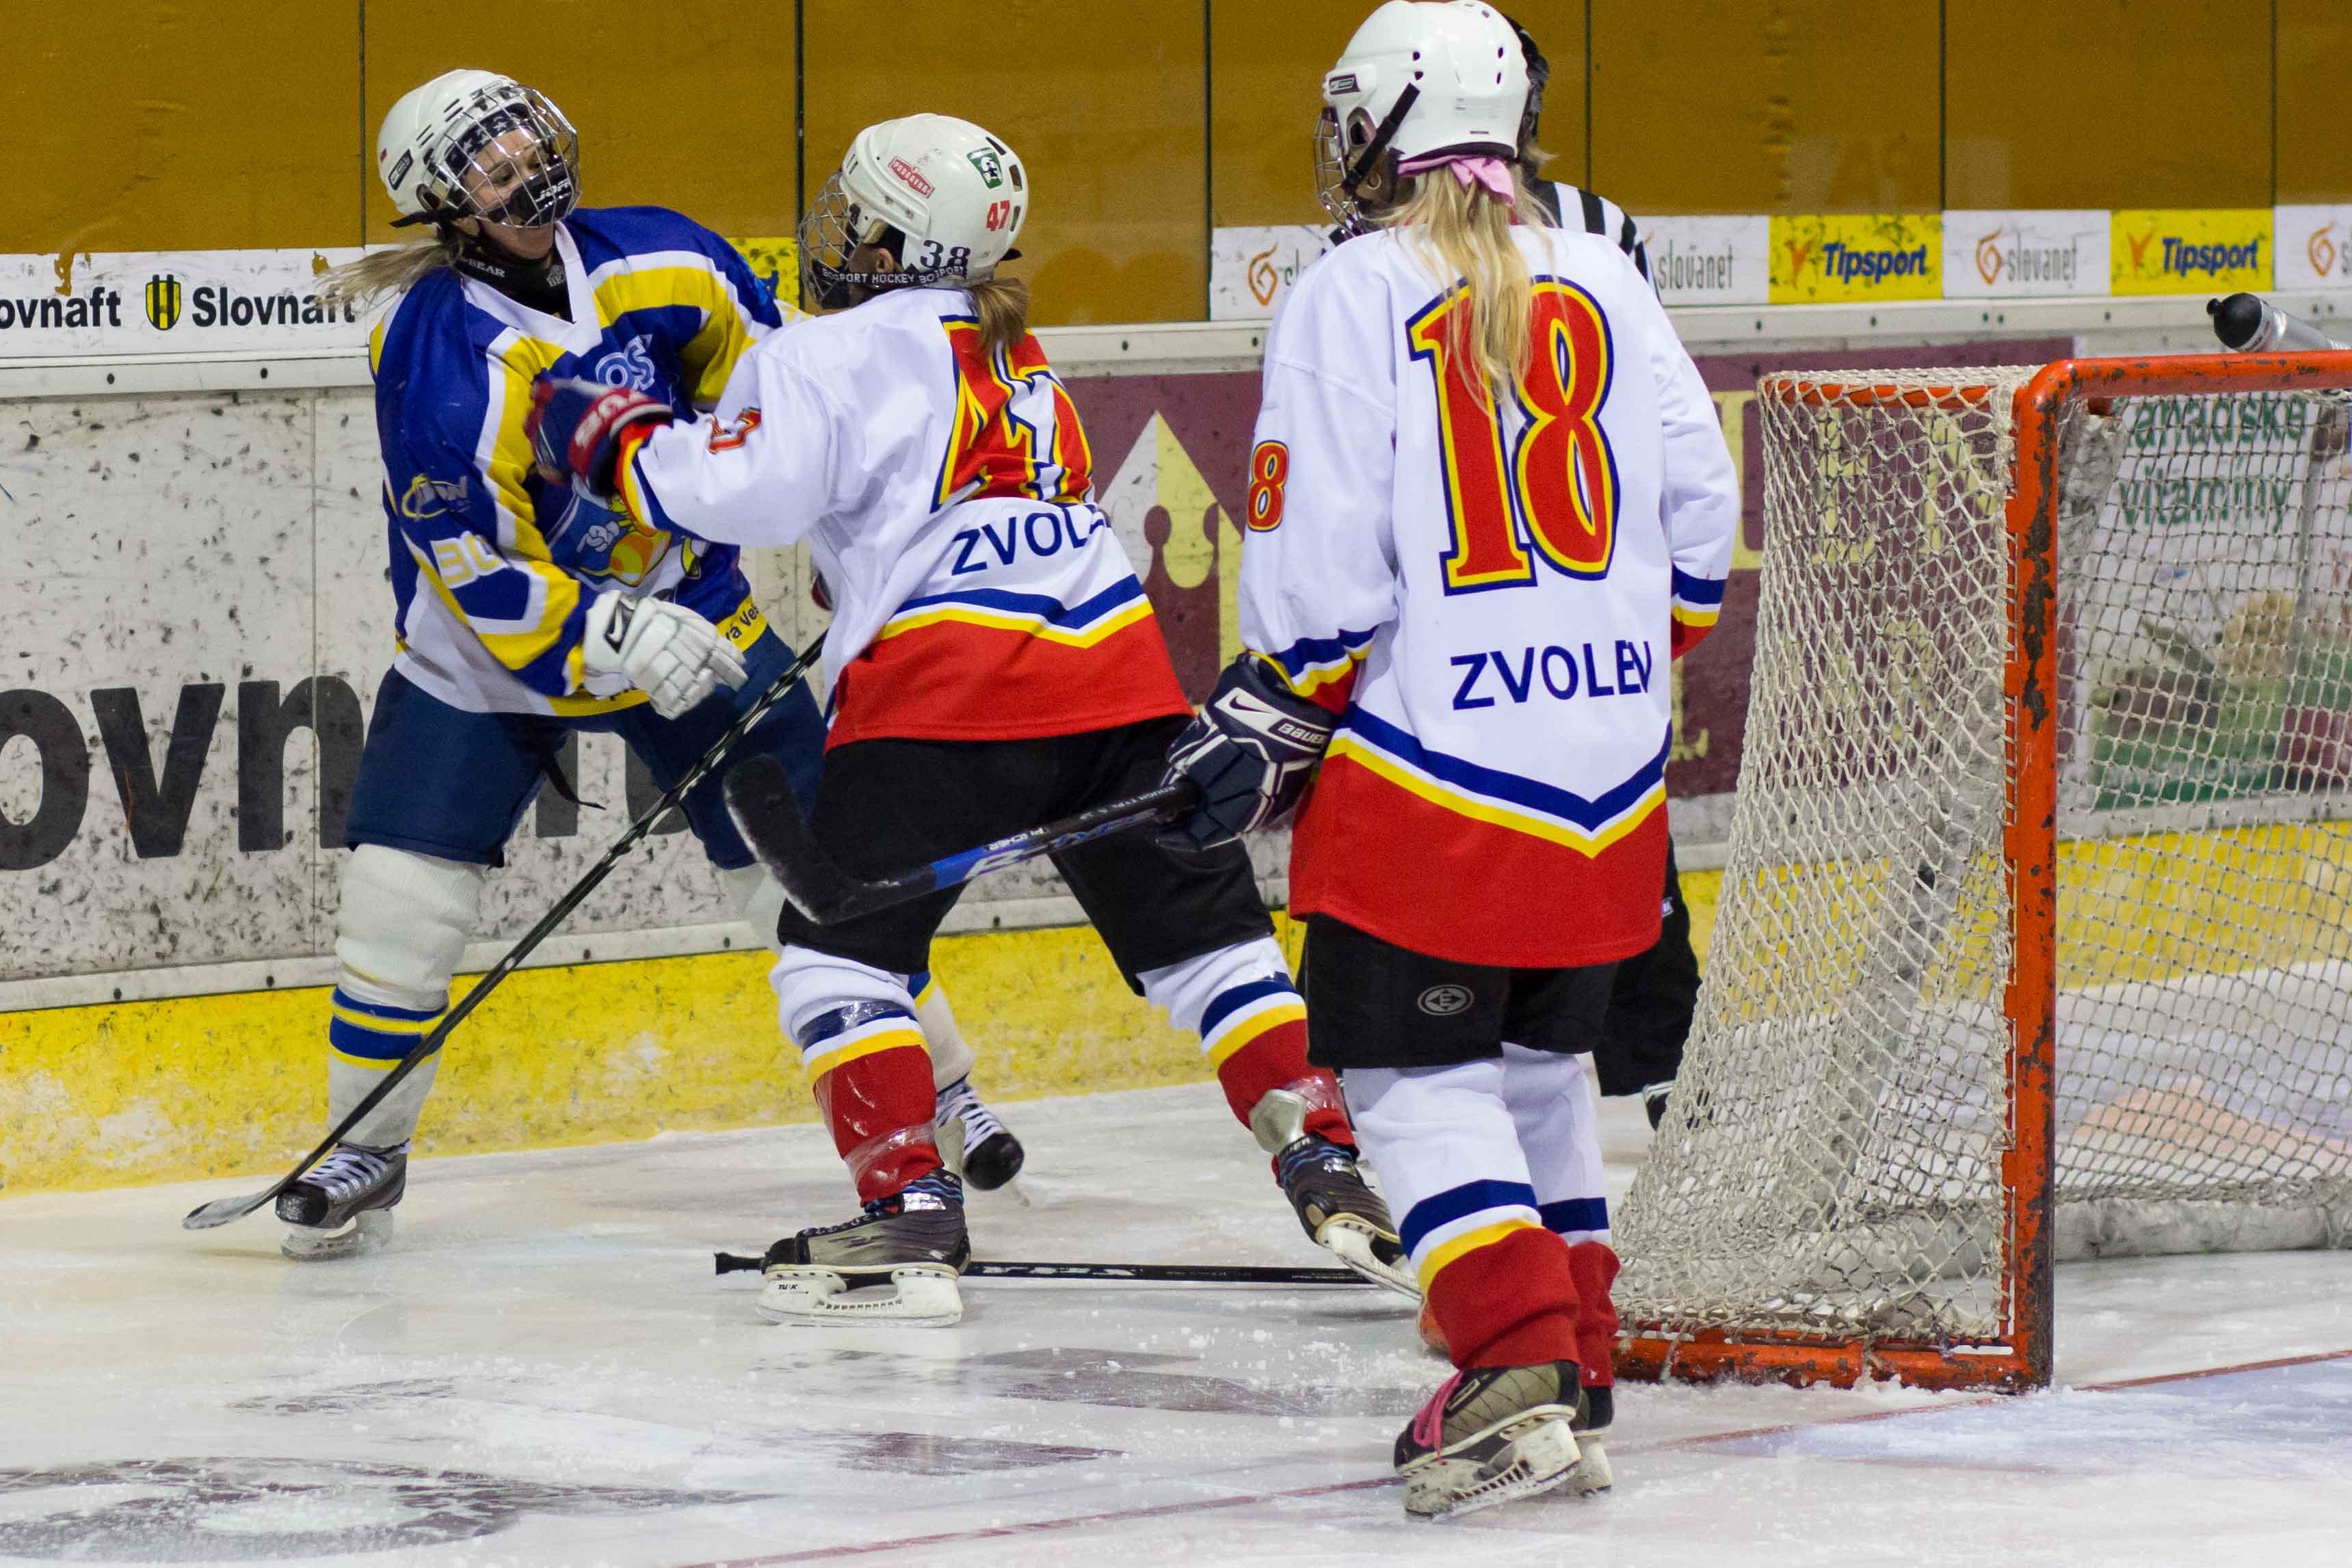 zhkm-zvolen-hc-spisska-n-ves-2013-hokej-11